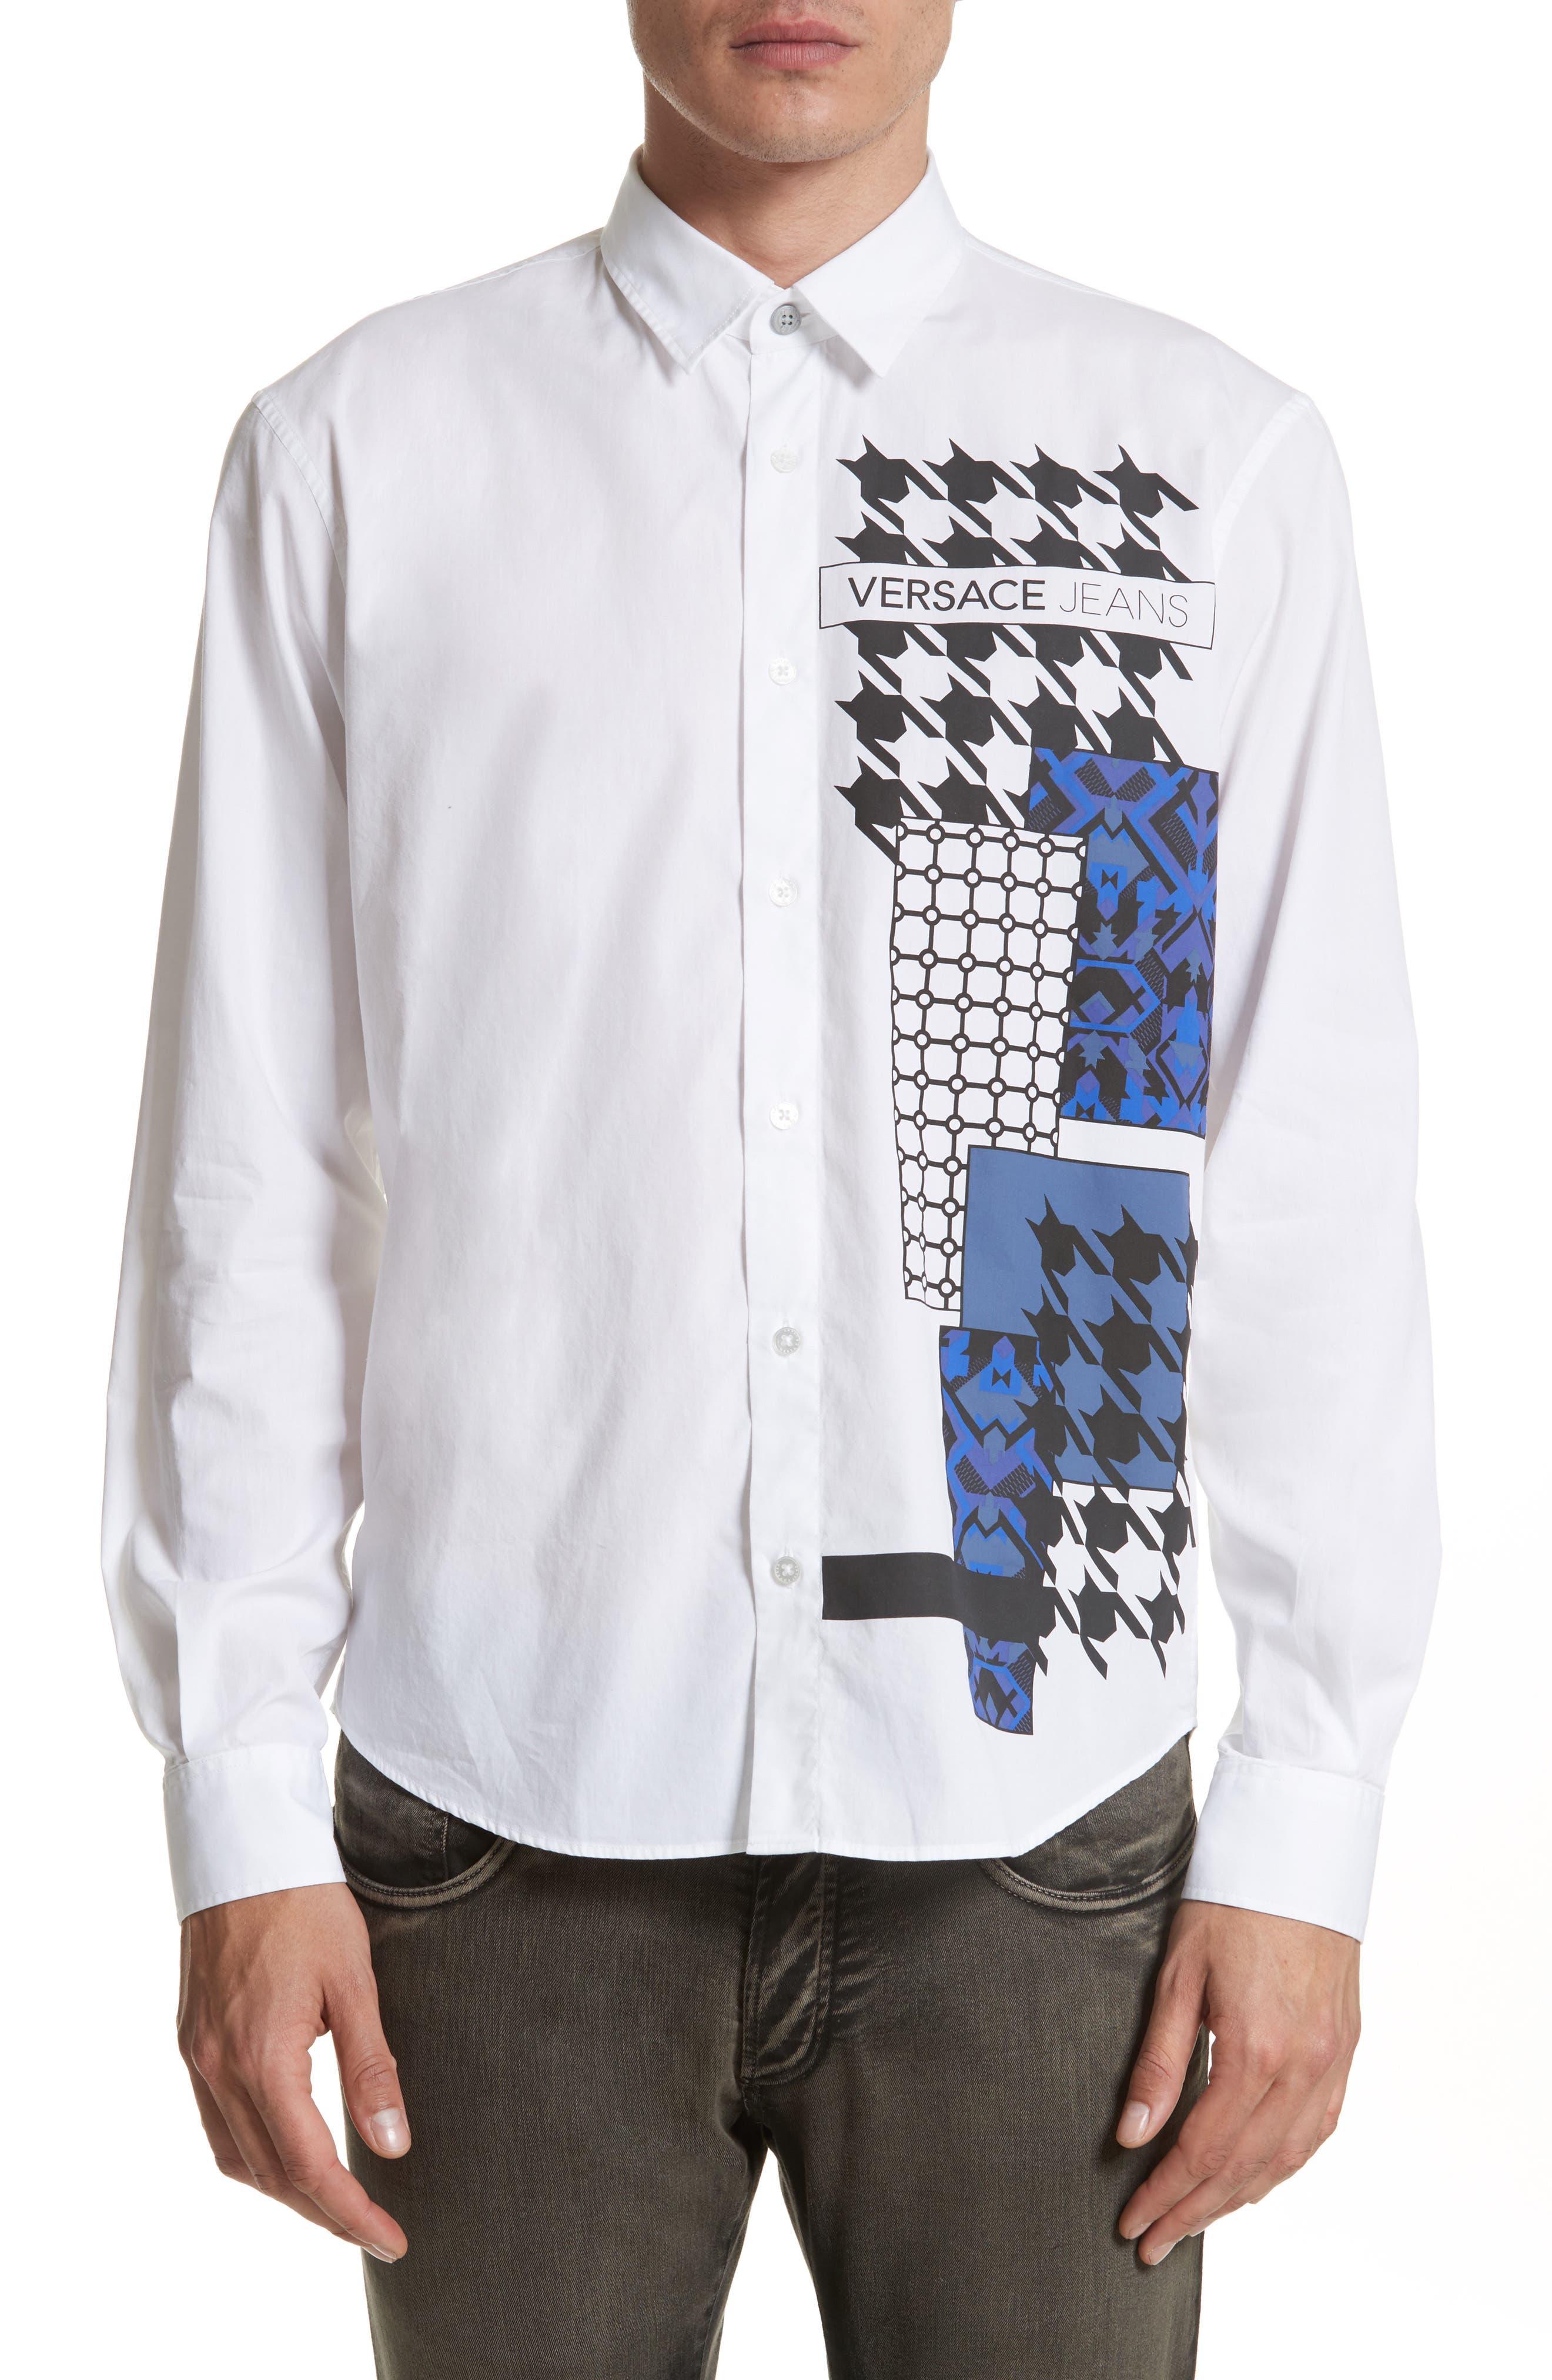 Versace Jeans Houndstooth Print Sport Shirt